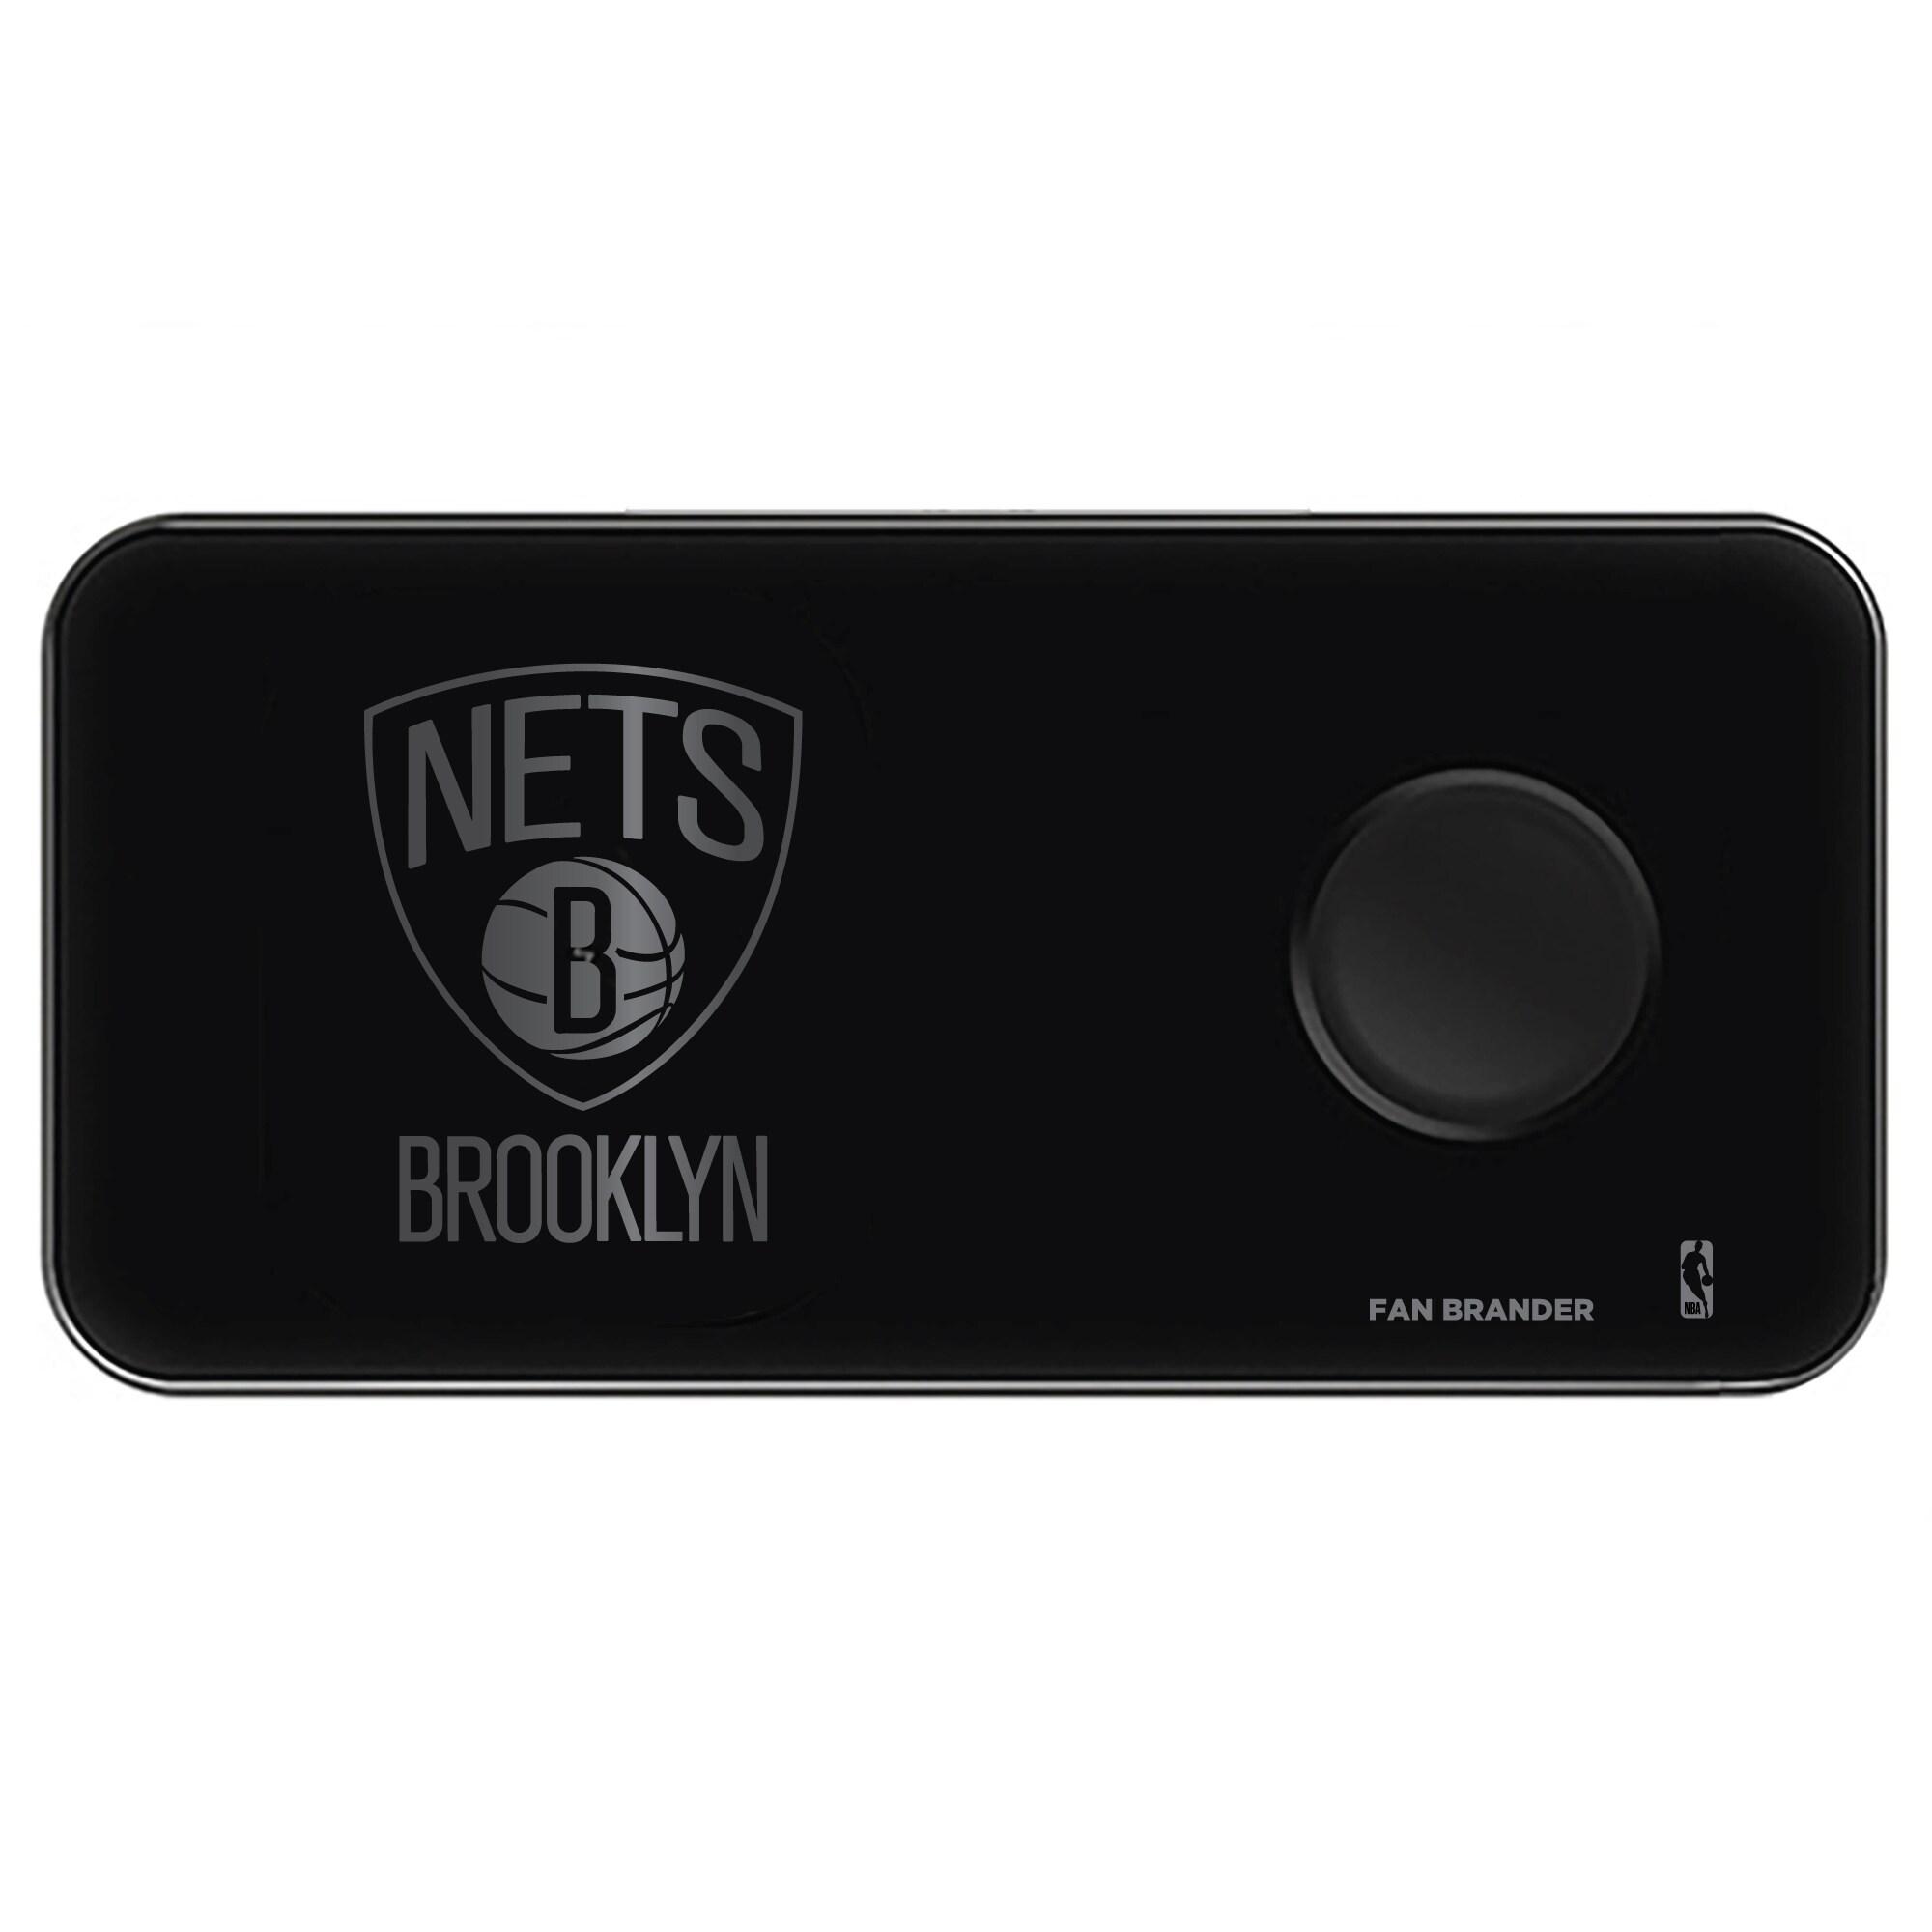 Brooklyn Nets 3-in-1 Glass Wireless Charge Pad - Black